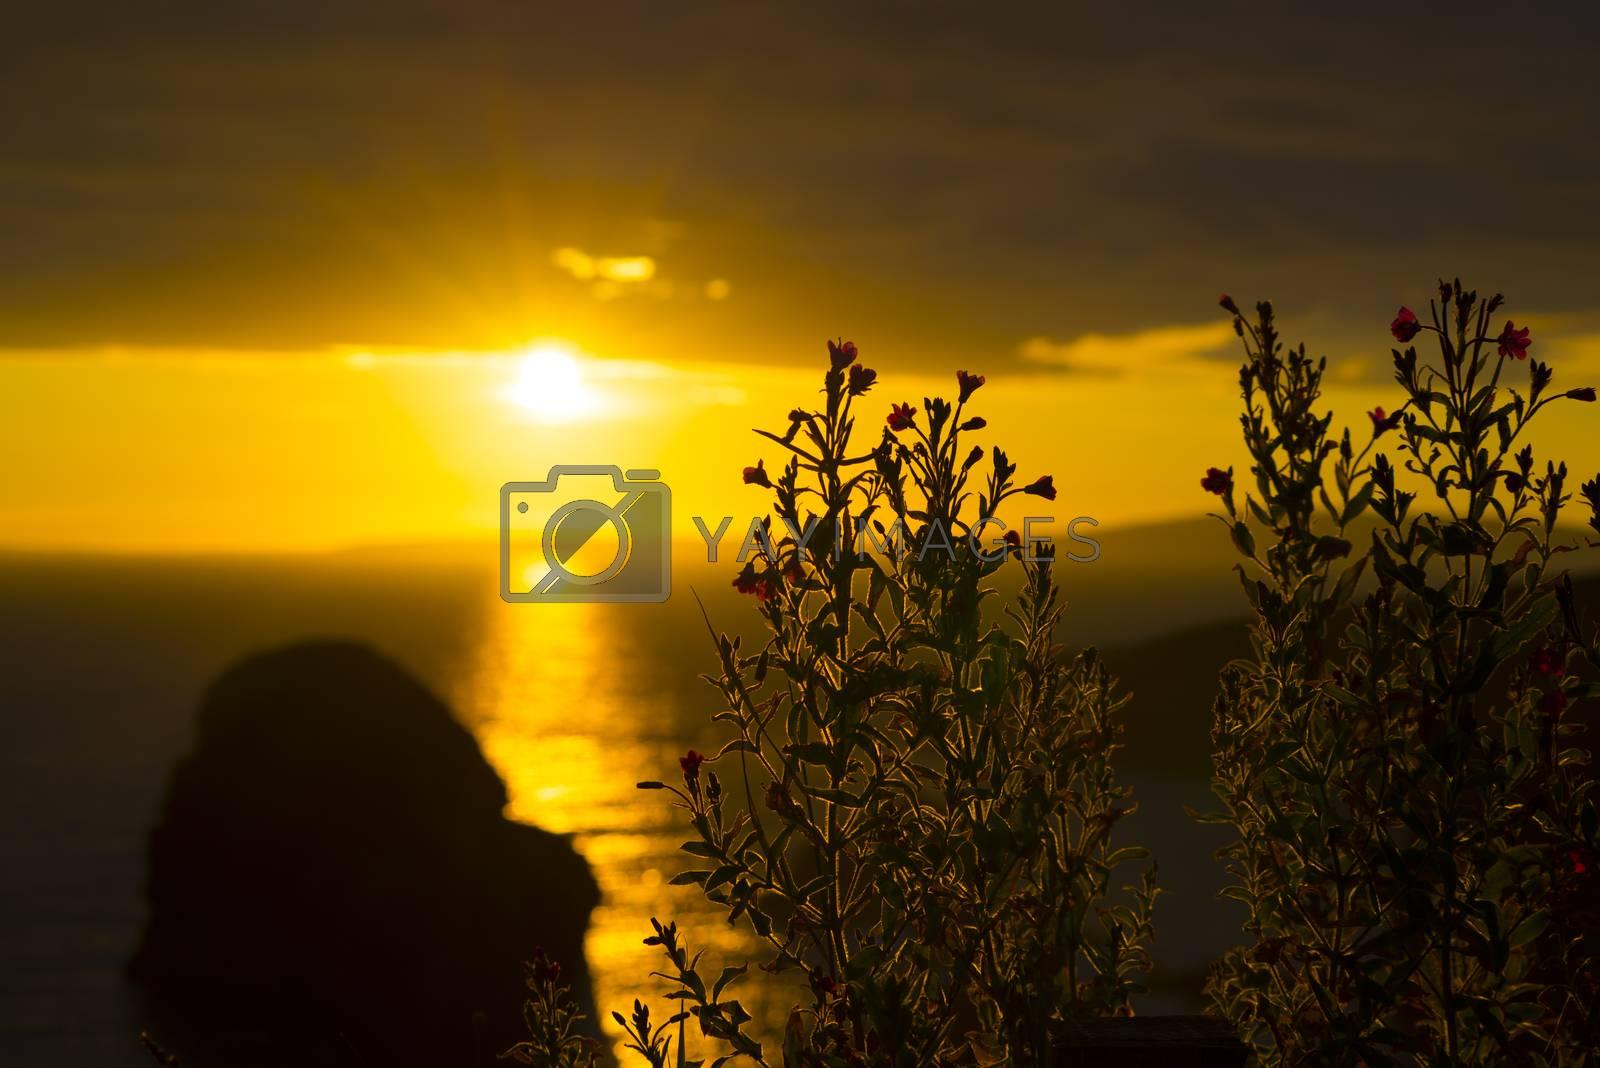 wild atlantic way sunset flowers by morrbyte